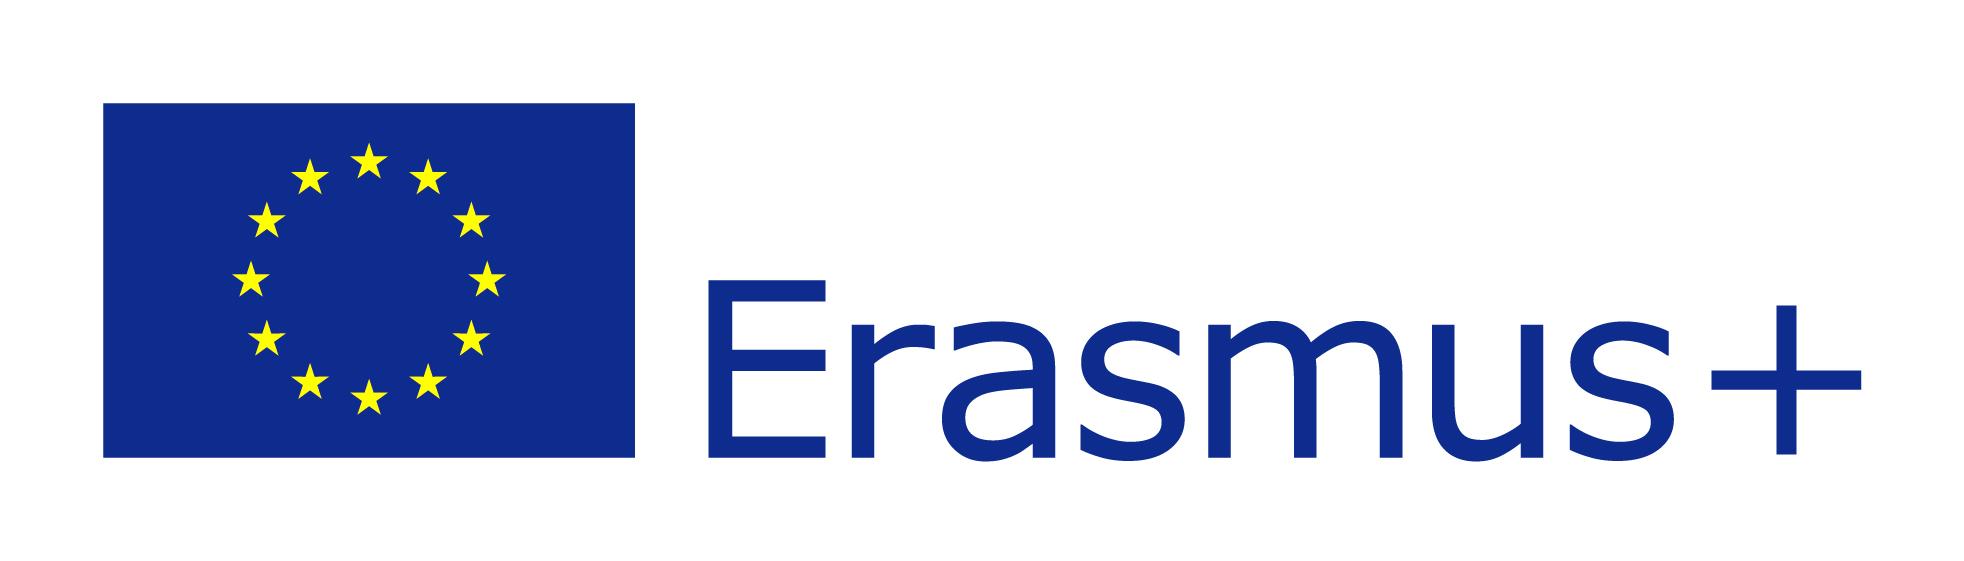 http://www.cit.ie/contentfiles/images/Erasmus/EU%20flagErasmus.jpg